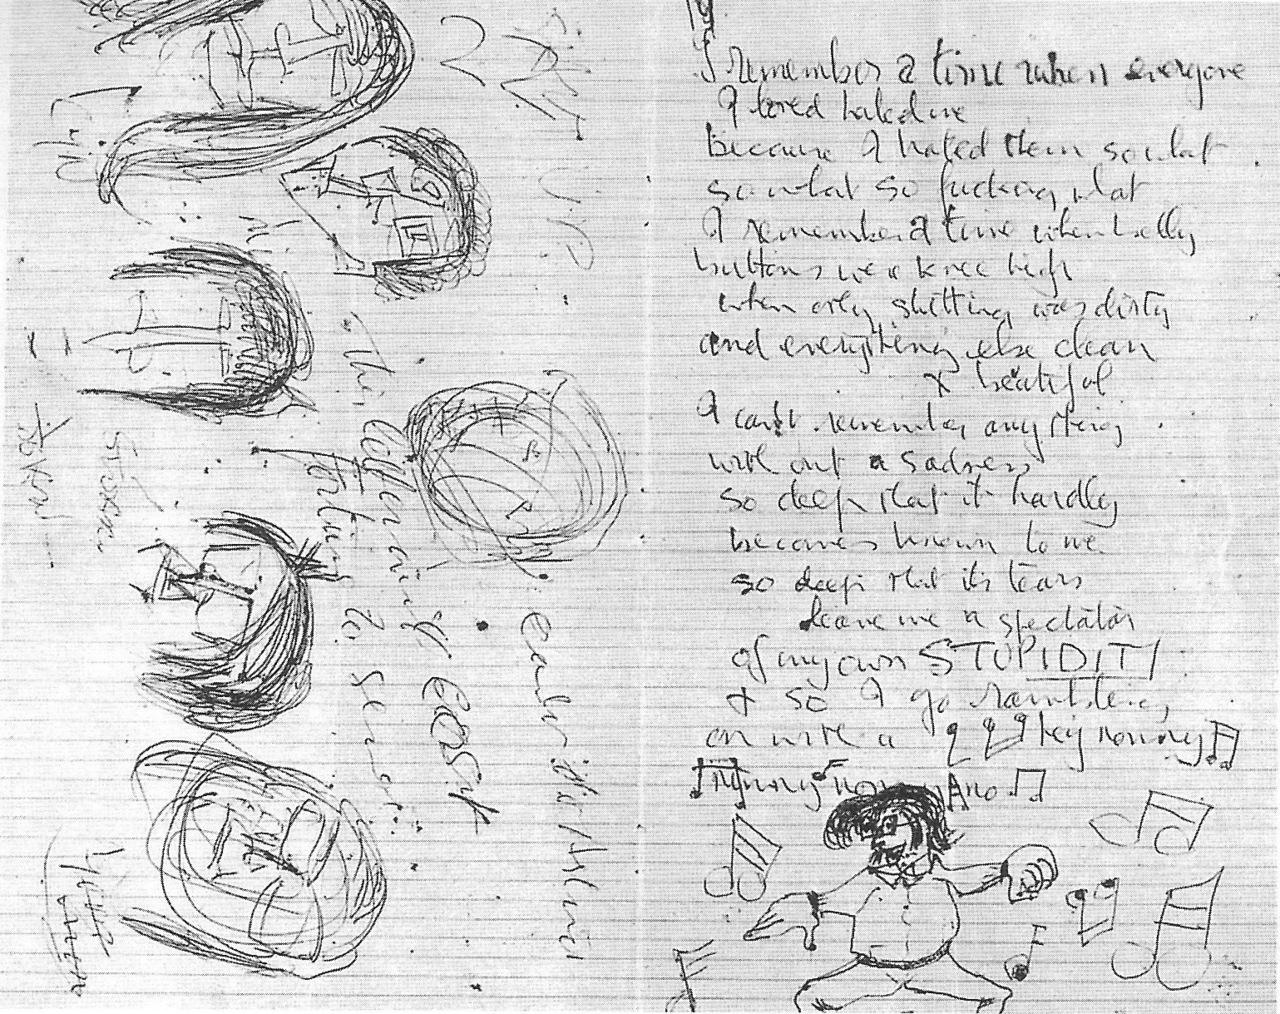 A letter to Stu Sutcliffe written kwa John Lennon